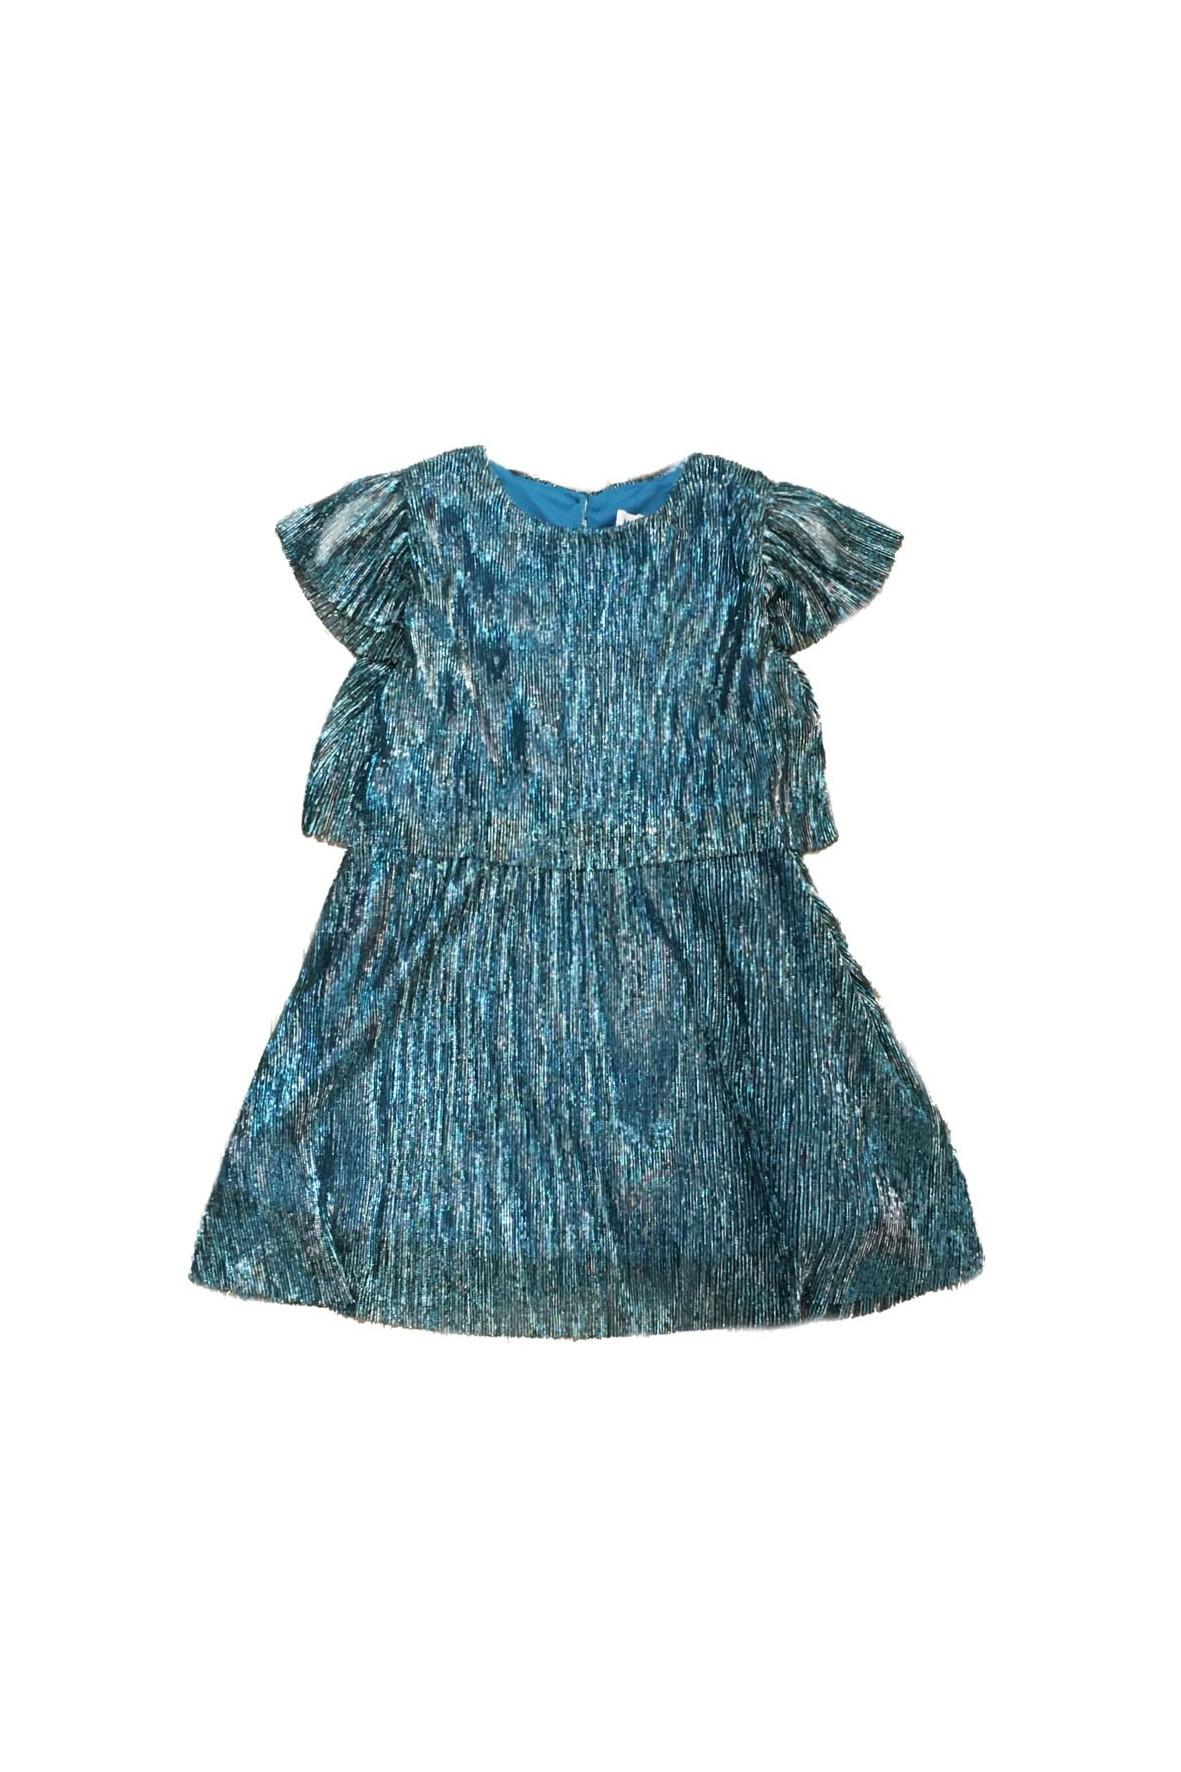 Elegancka sukienka na specjalne okazje-niebieska